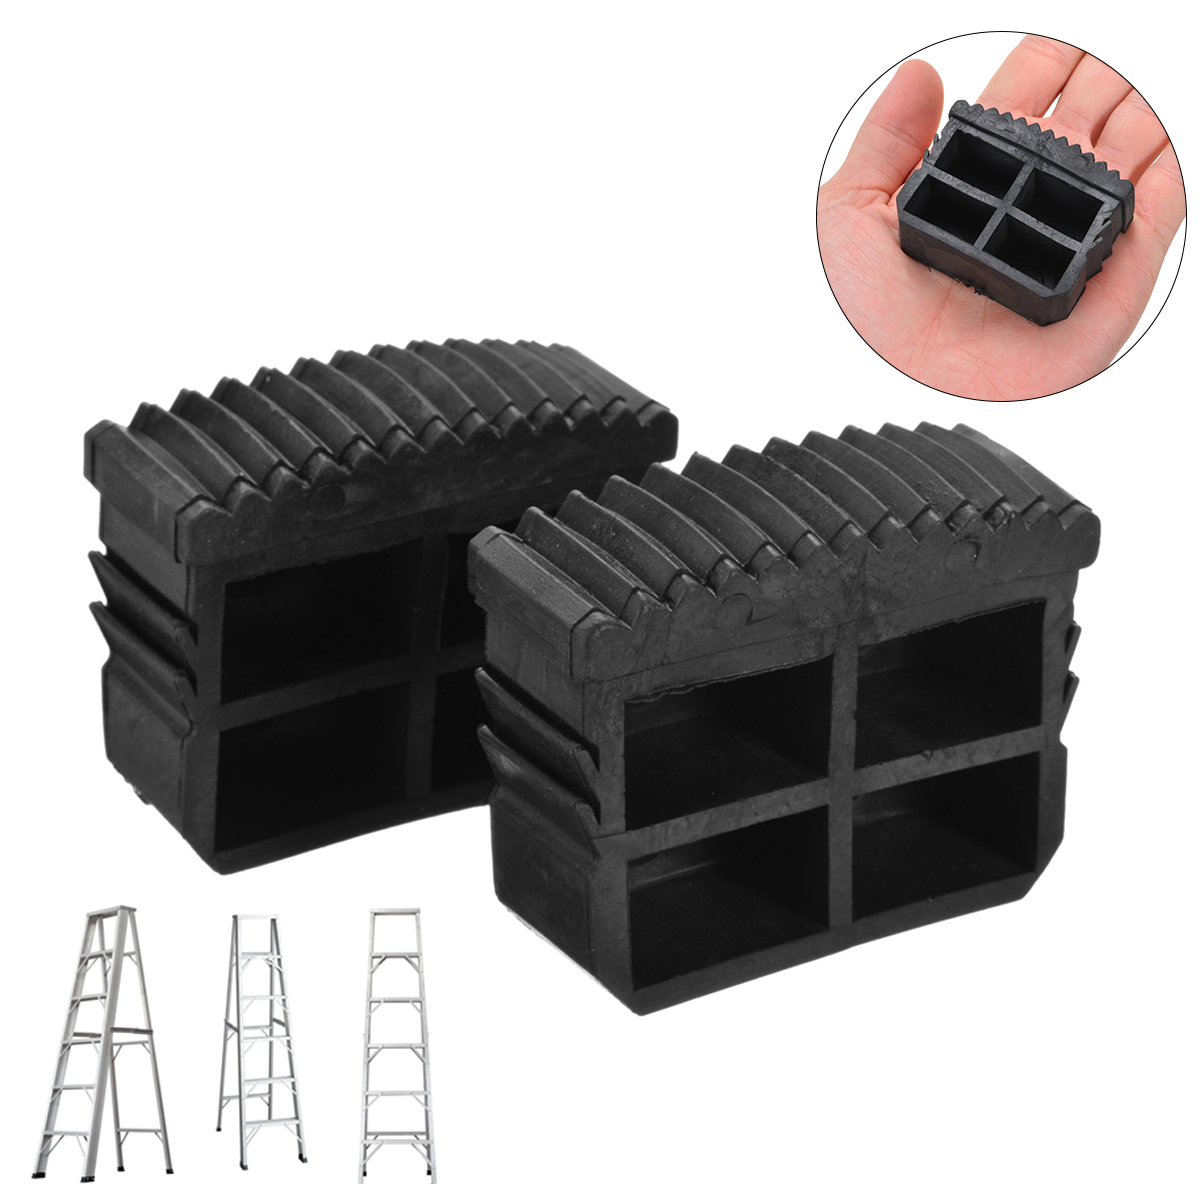 2pcs Black Rubber Step Ladder Feet Non Slip Folding Ladder Foot Replacement Grip Antiskid Inner Plug Cover Ladder Accessories